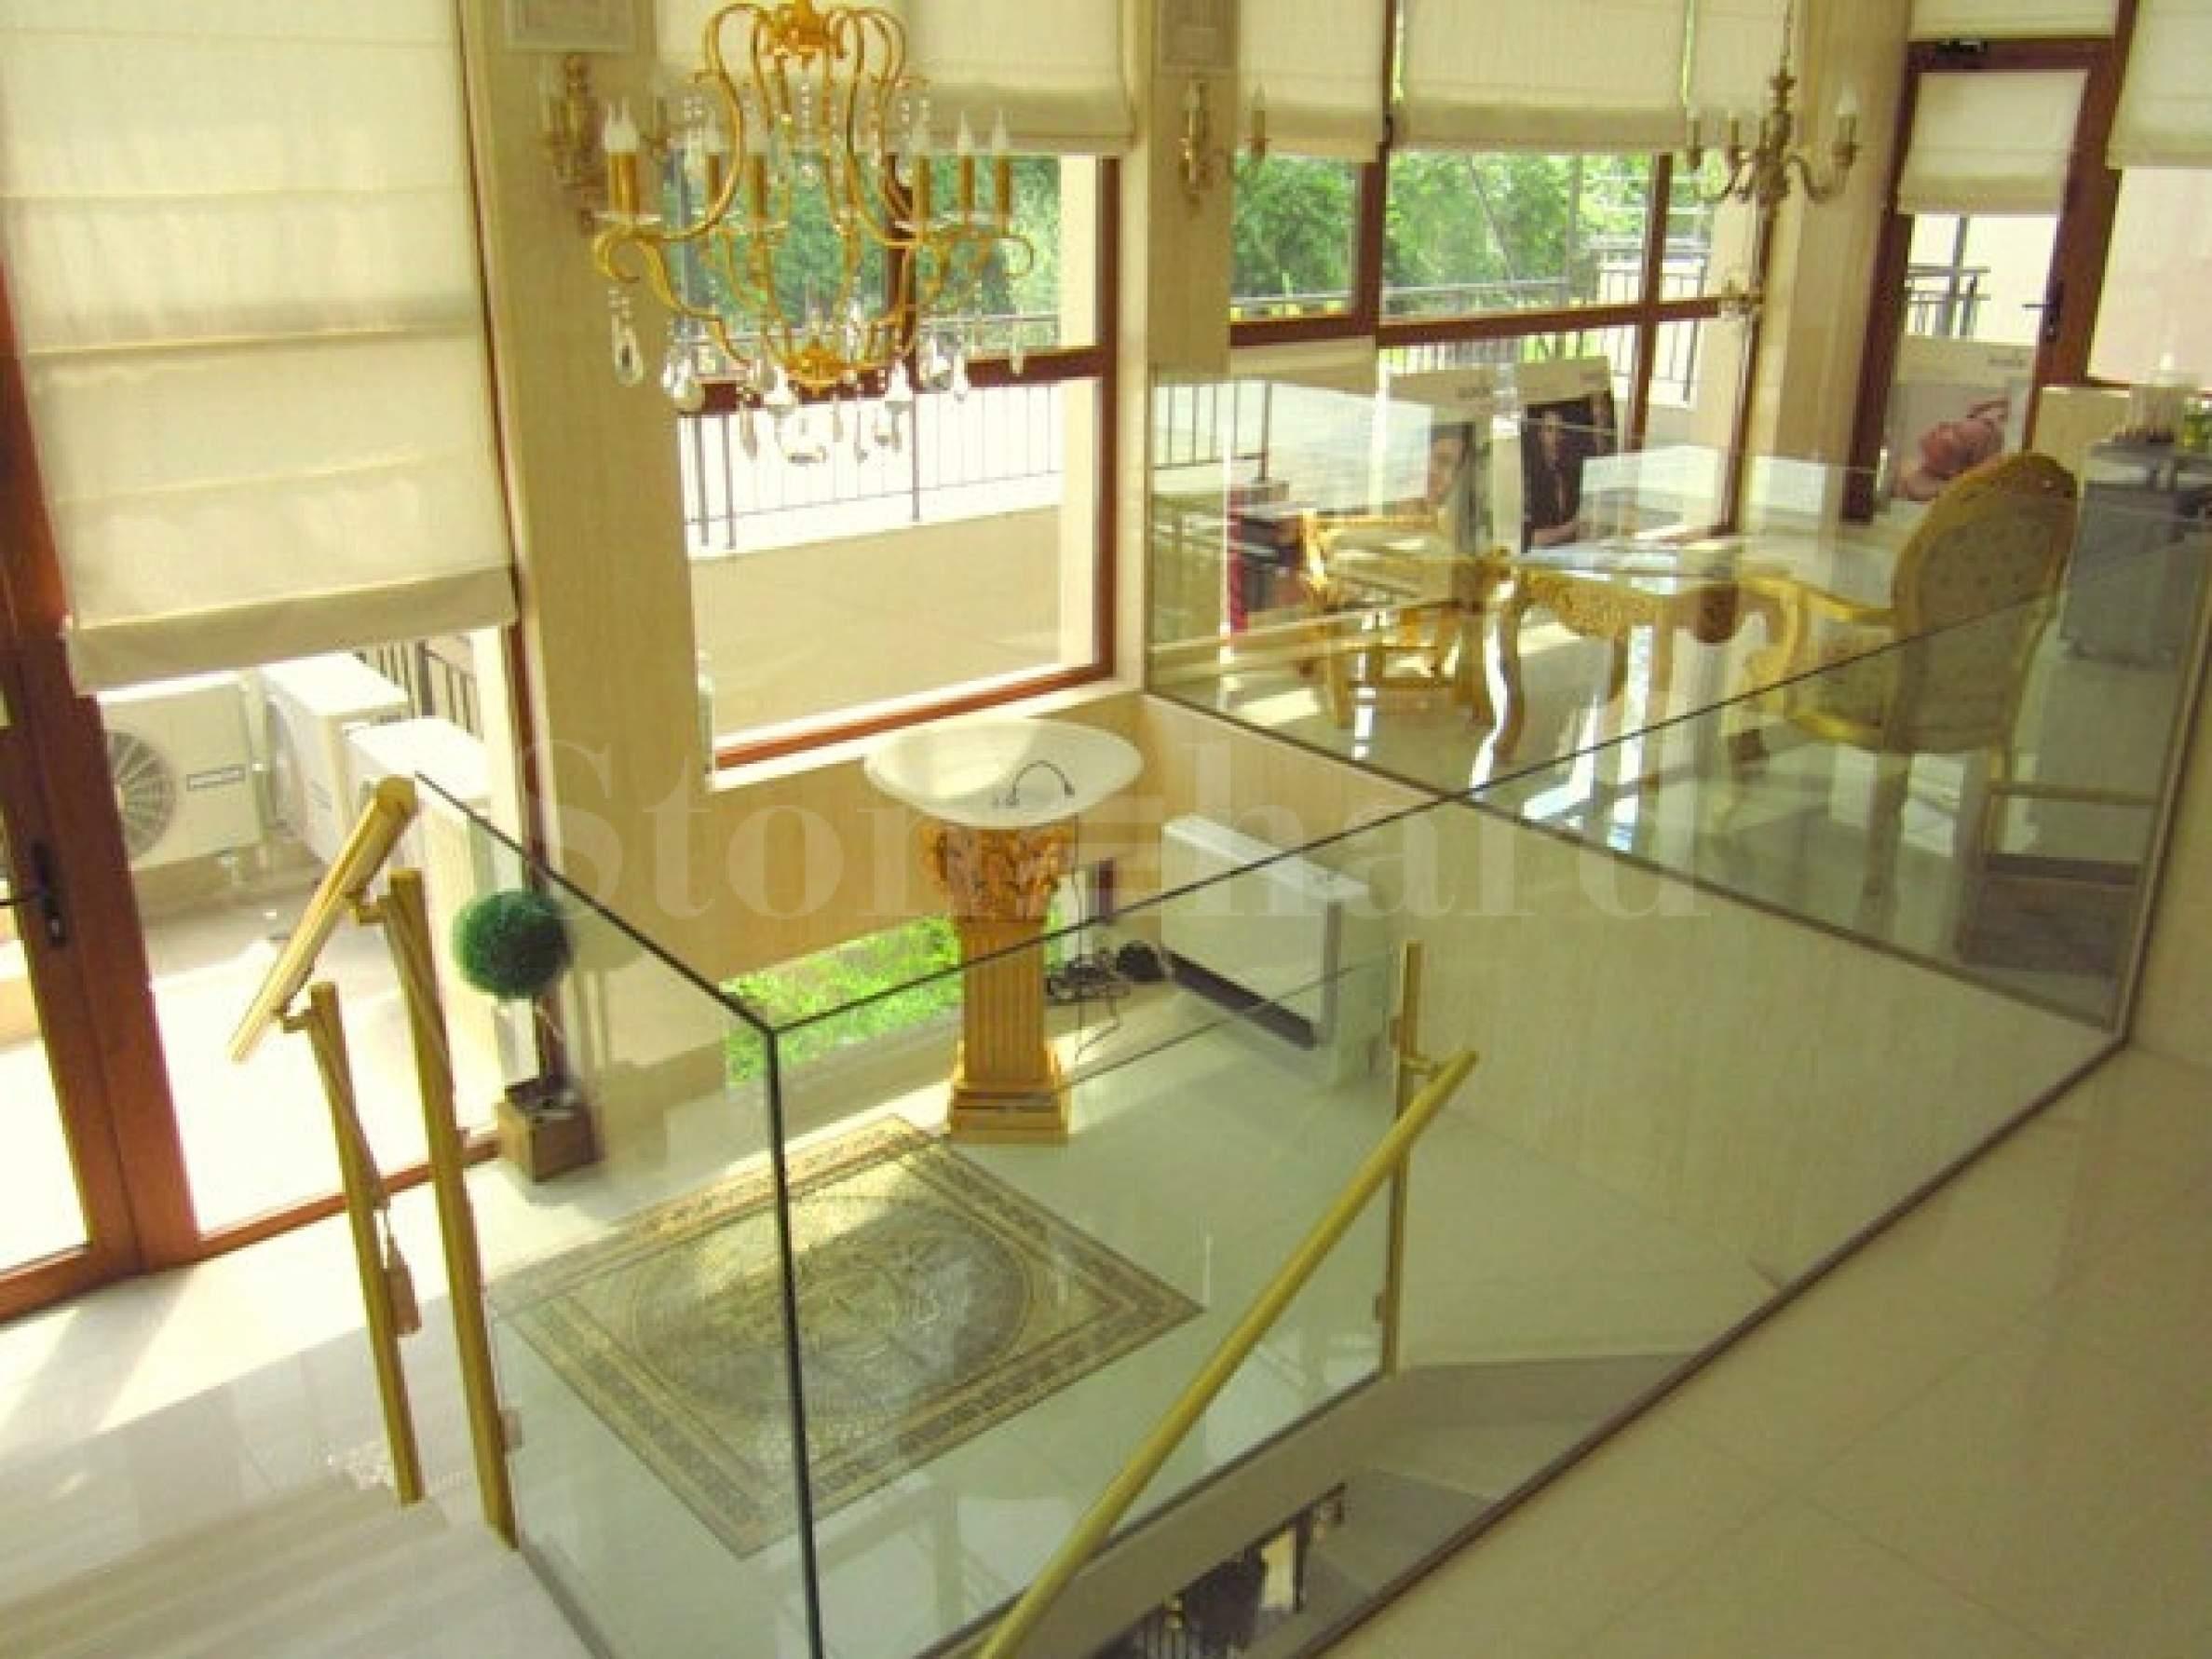 Luxury spa and wellness center2 - Stonehard